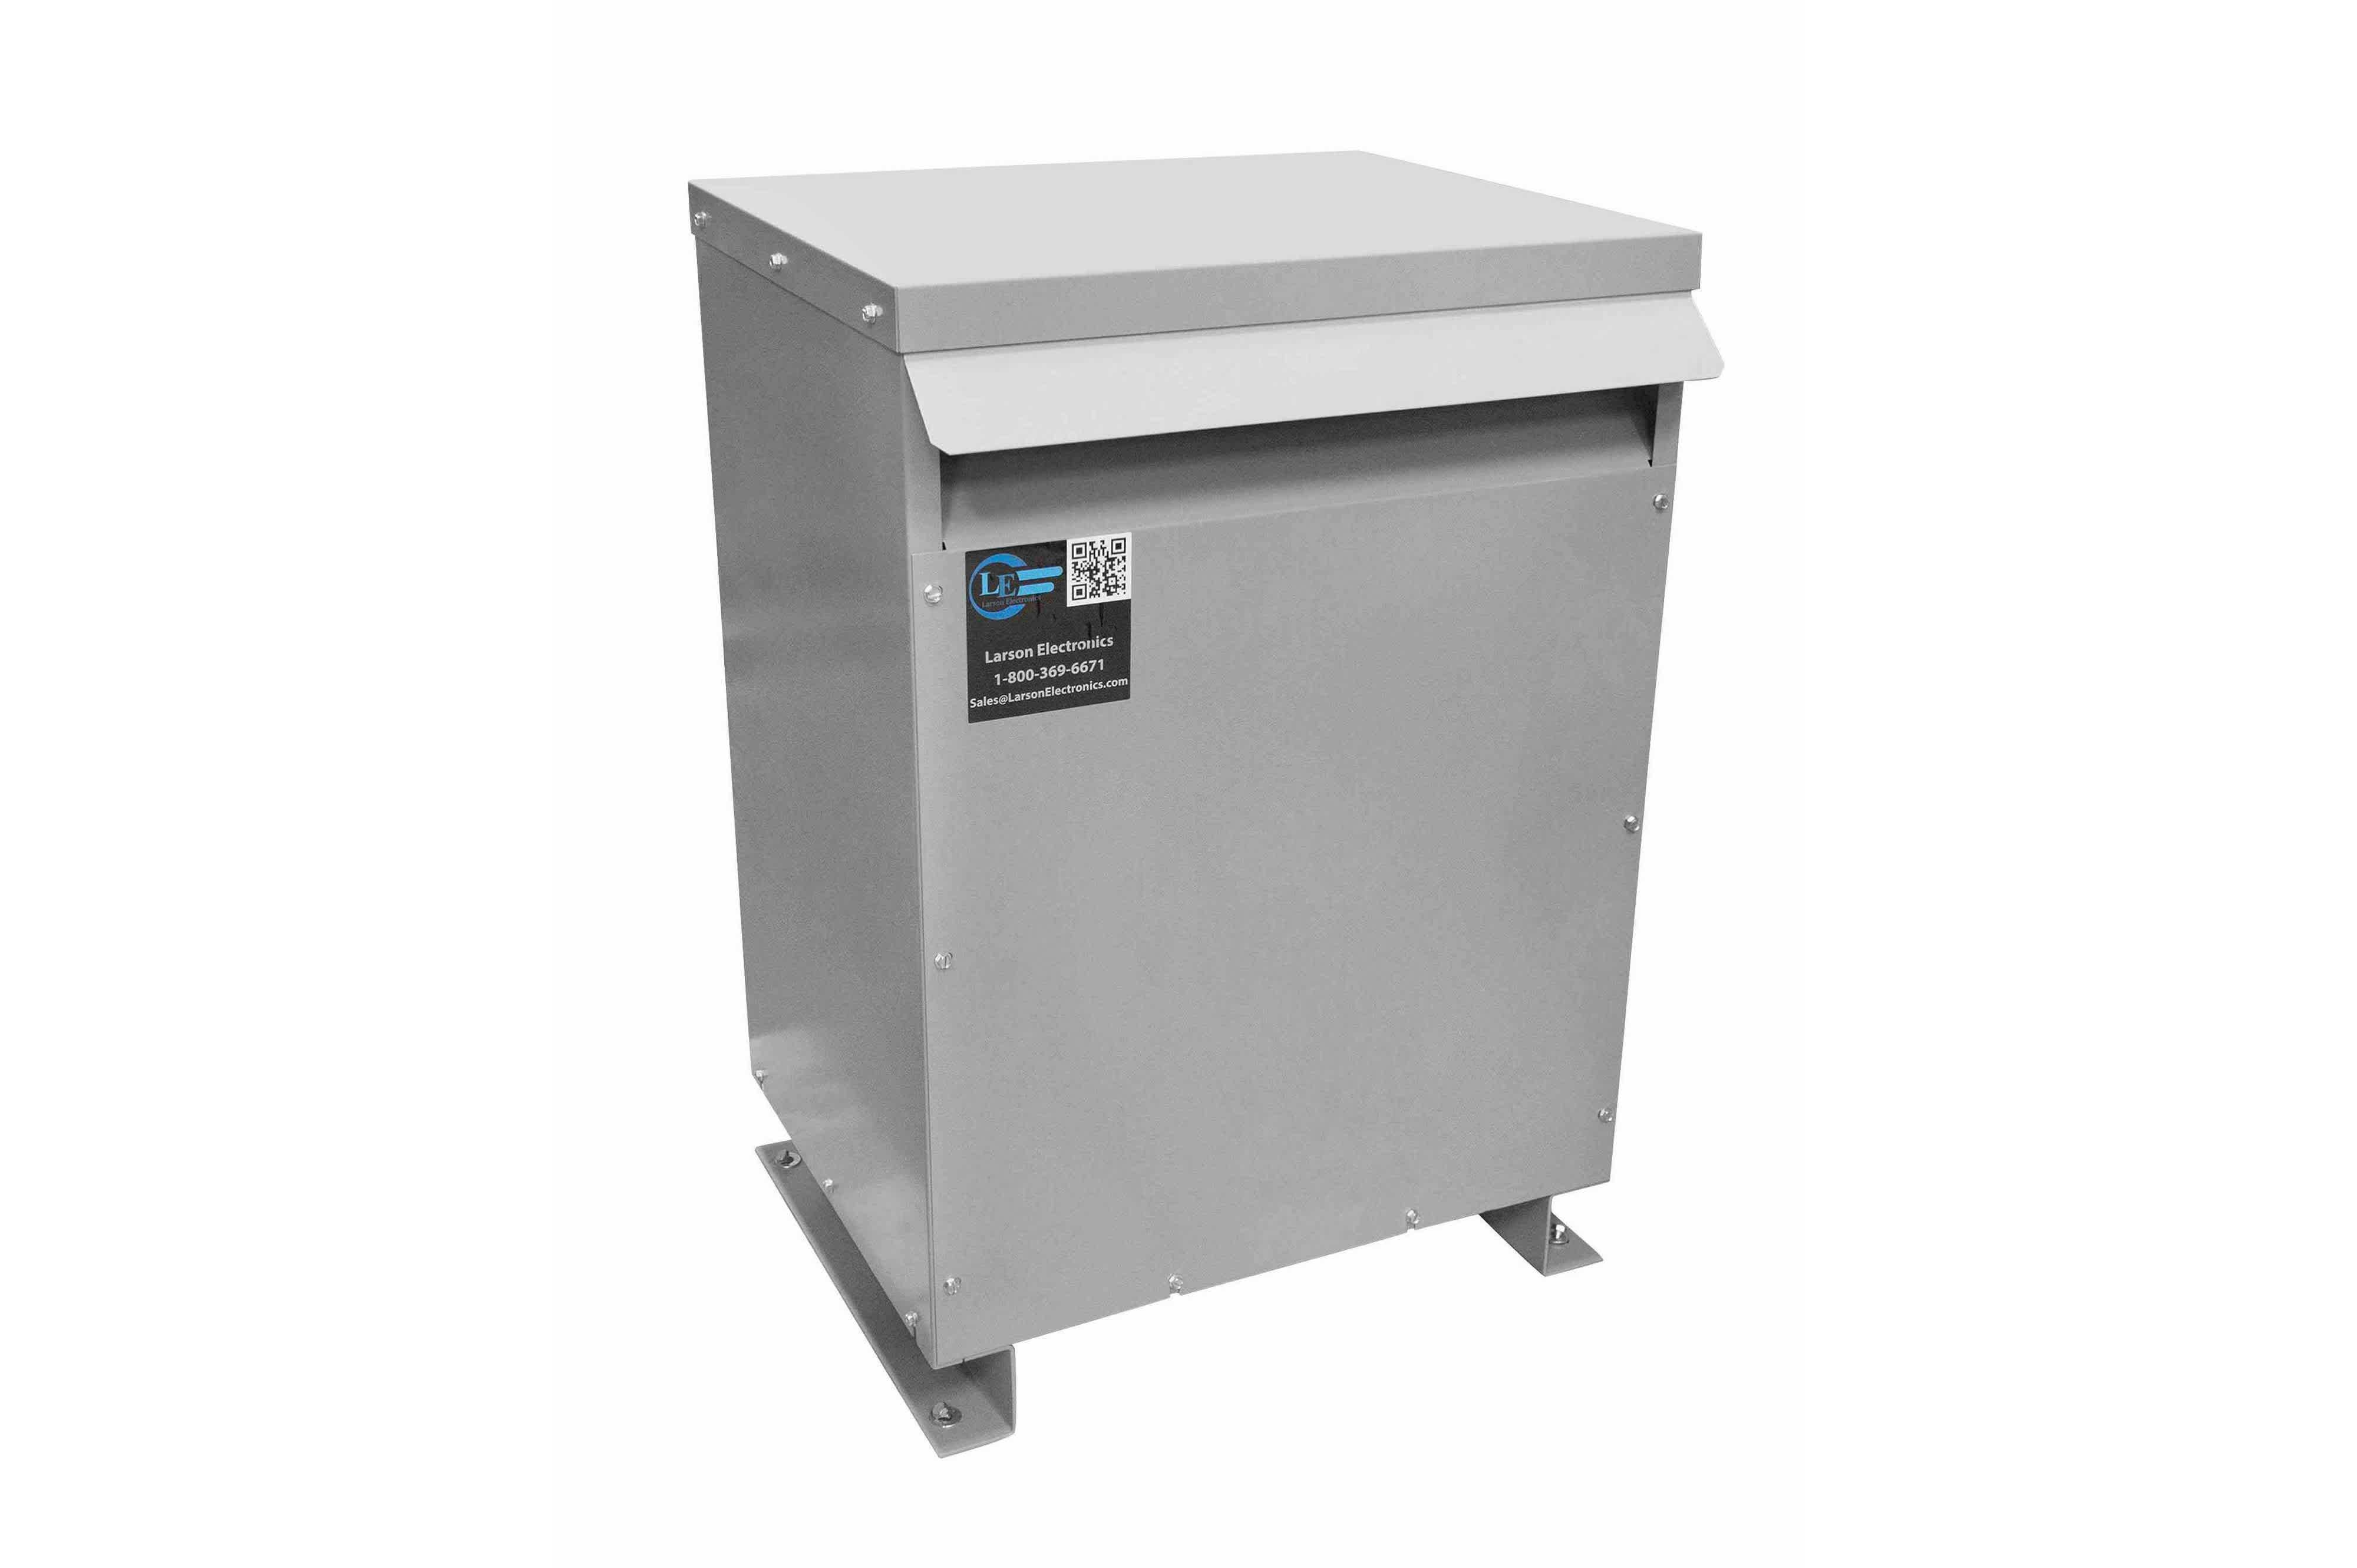 400 kVA 3PH DOE Transformer, 240V Delta Primary, 208Y/120 Wye-N Secondary, N3R, Ventilated, 60 Hz